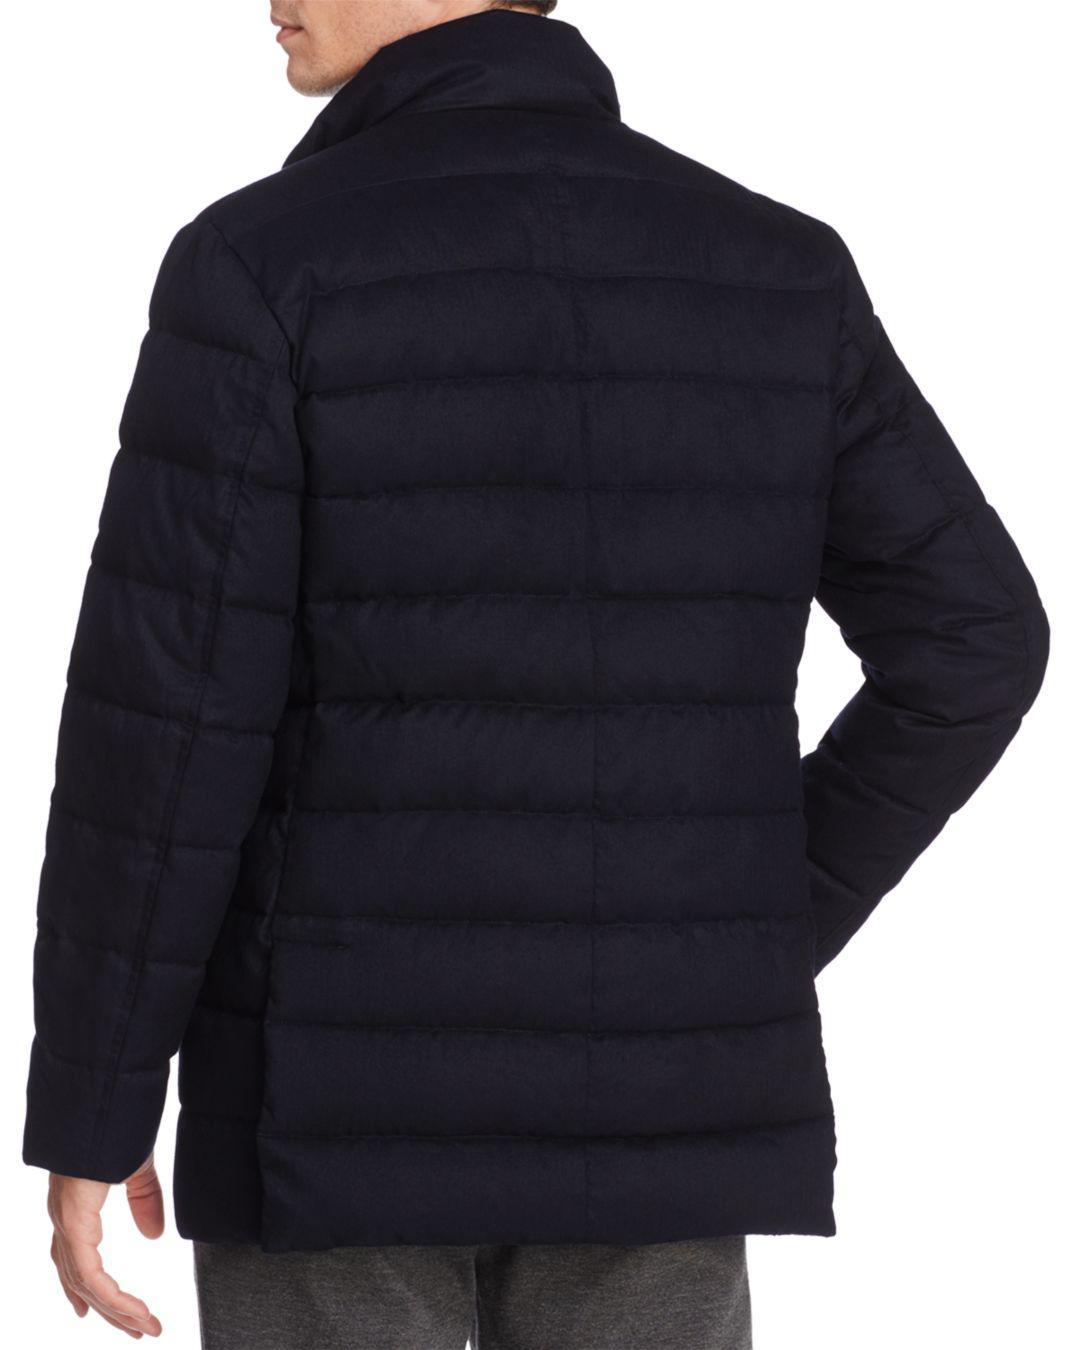 Cole Haan Flannel Down Jacket in Navy (Blue) for Men